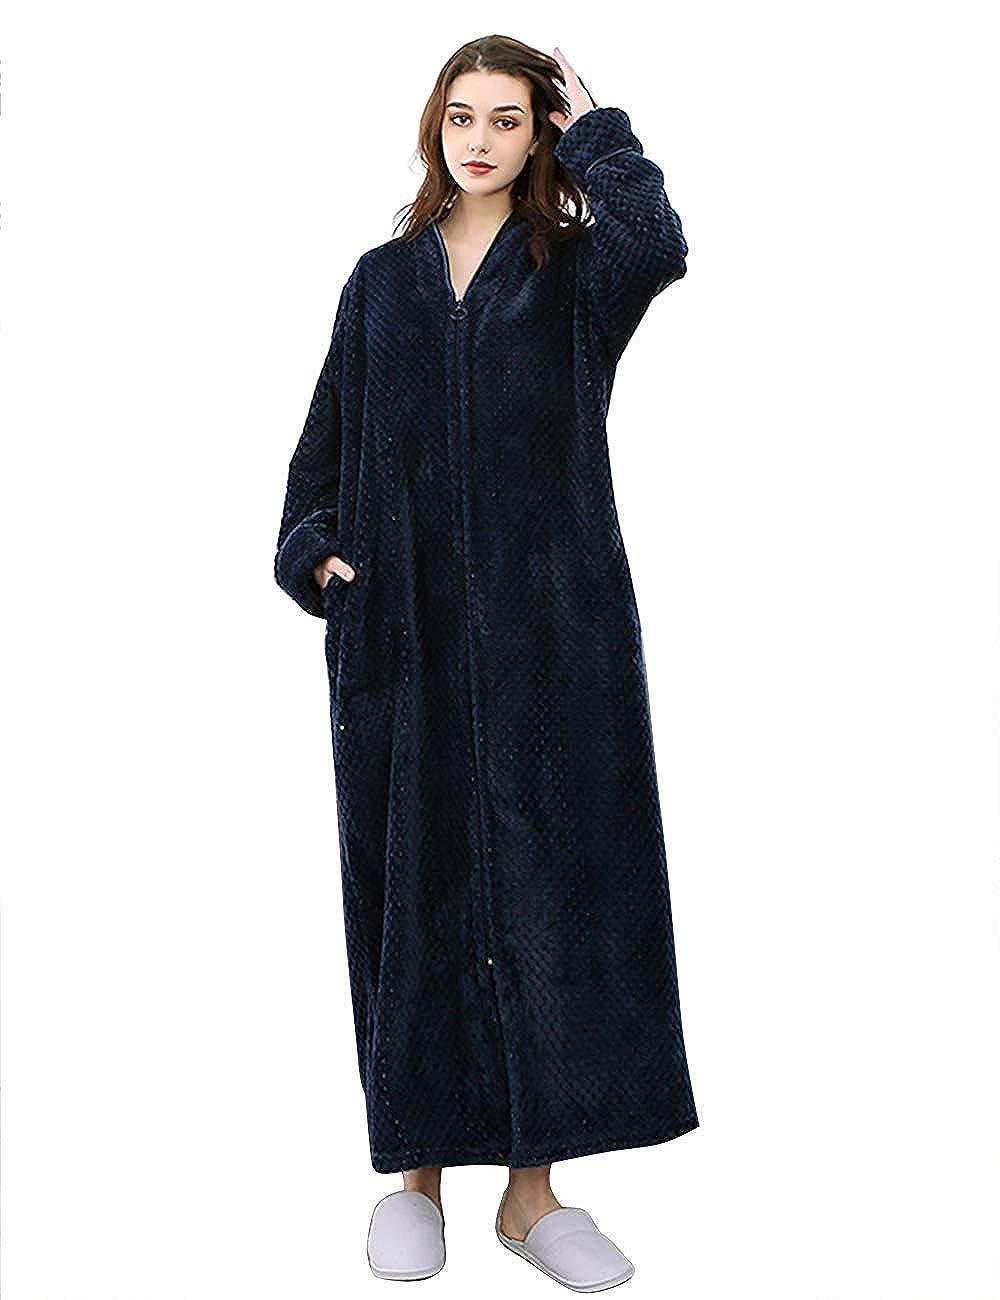 Lantesi Women's Waffle Fluffy Fleece Bathrobes Sleepwear Long Robes Zipper Front